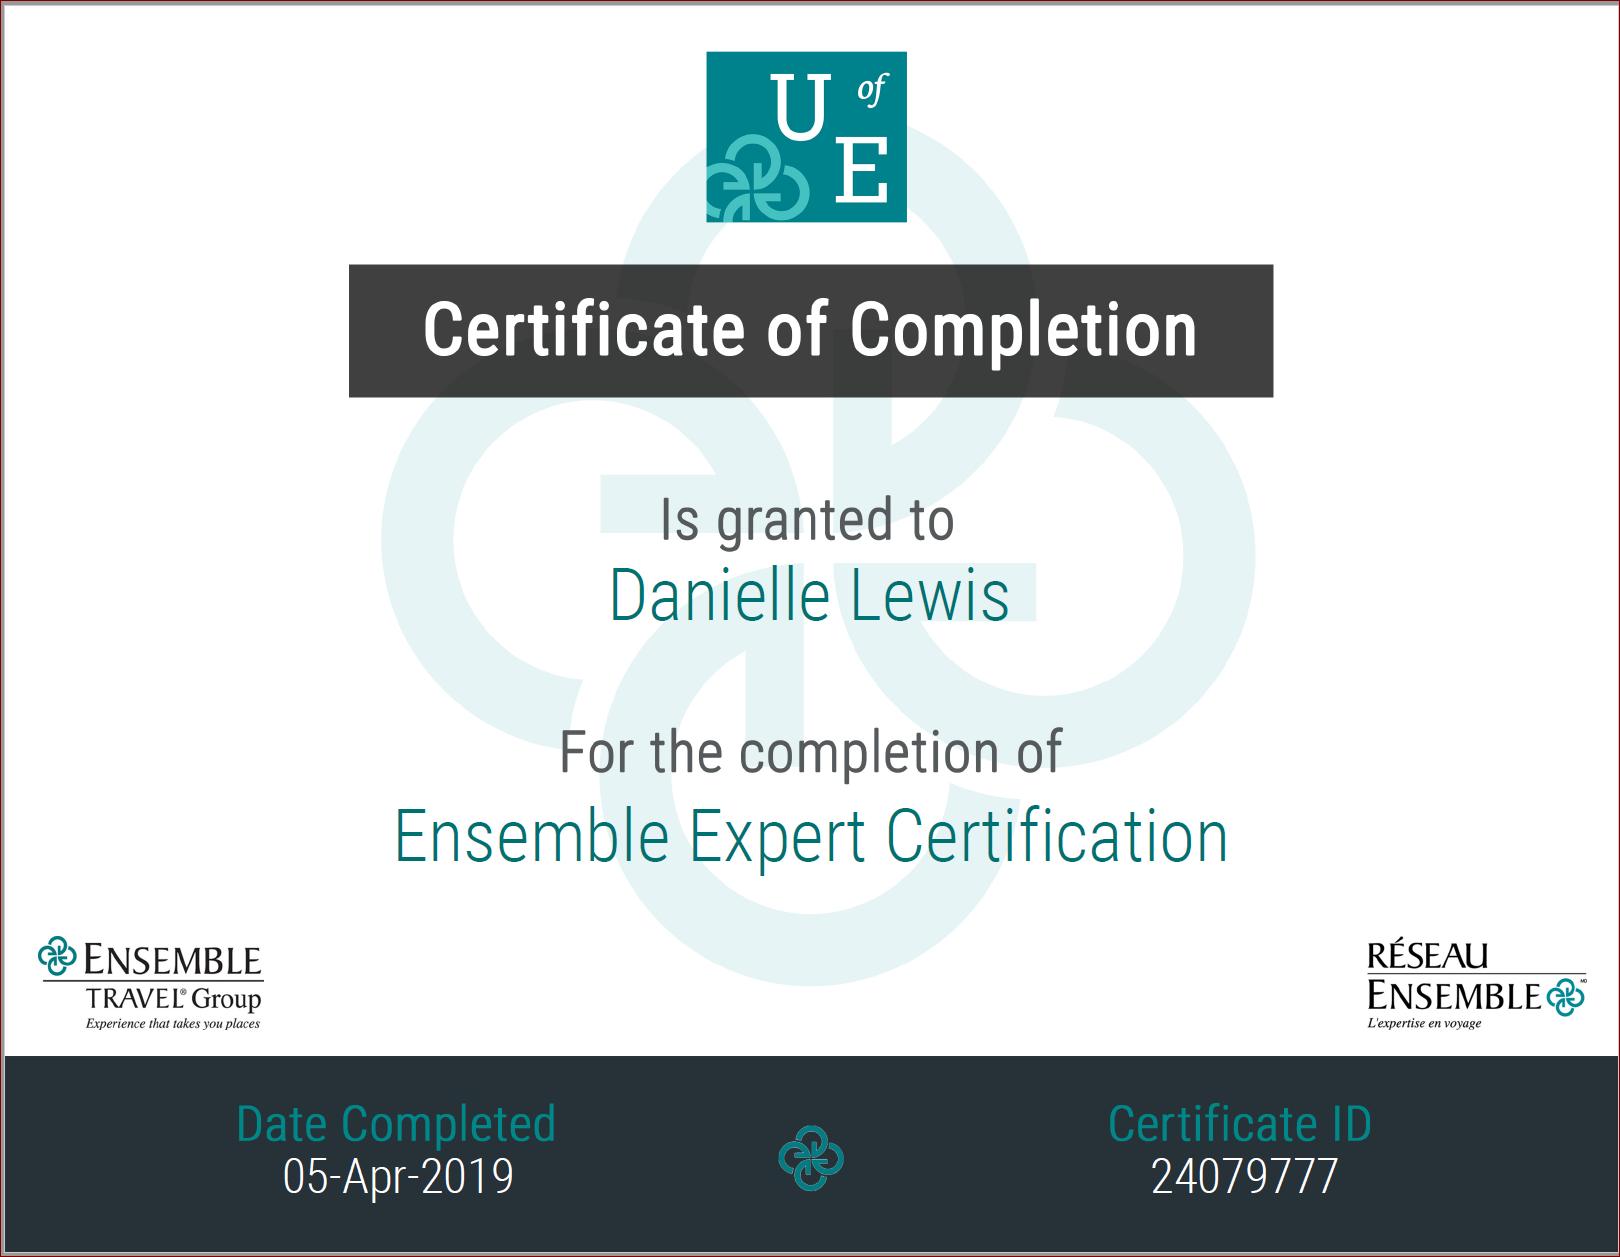 SelfishMe Travel - Ensemble (Consortium) Expert Certification